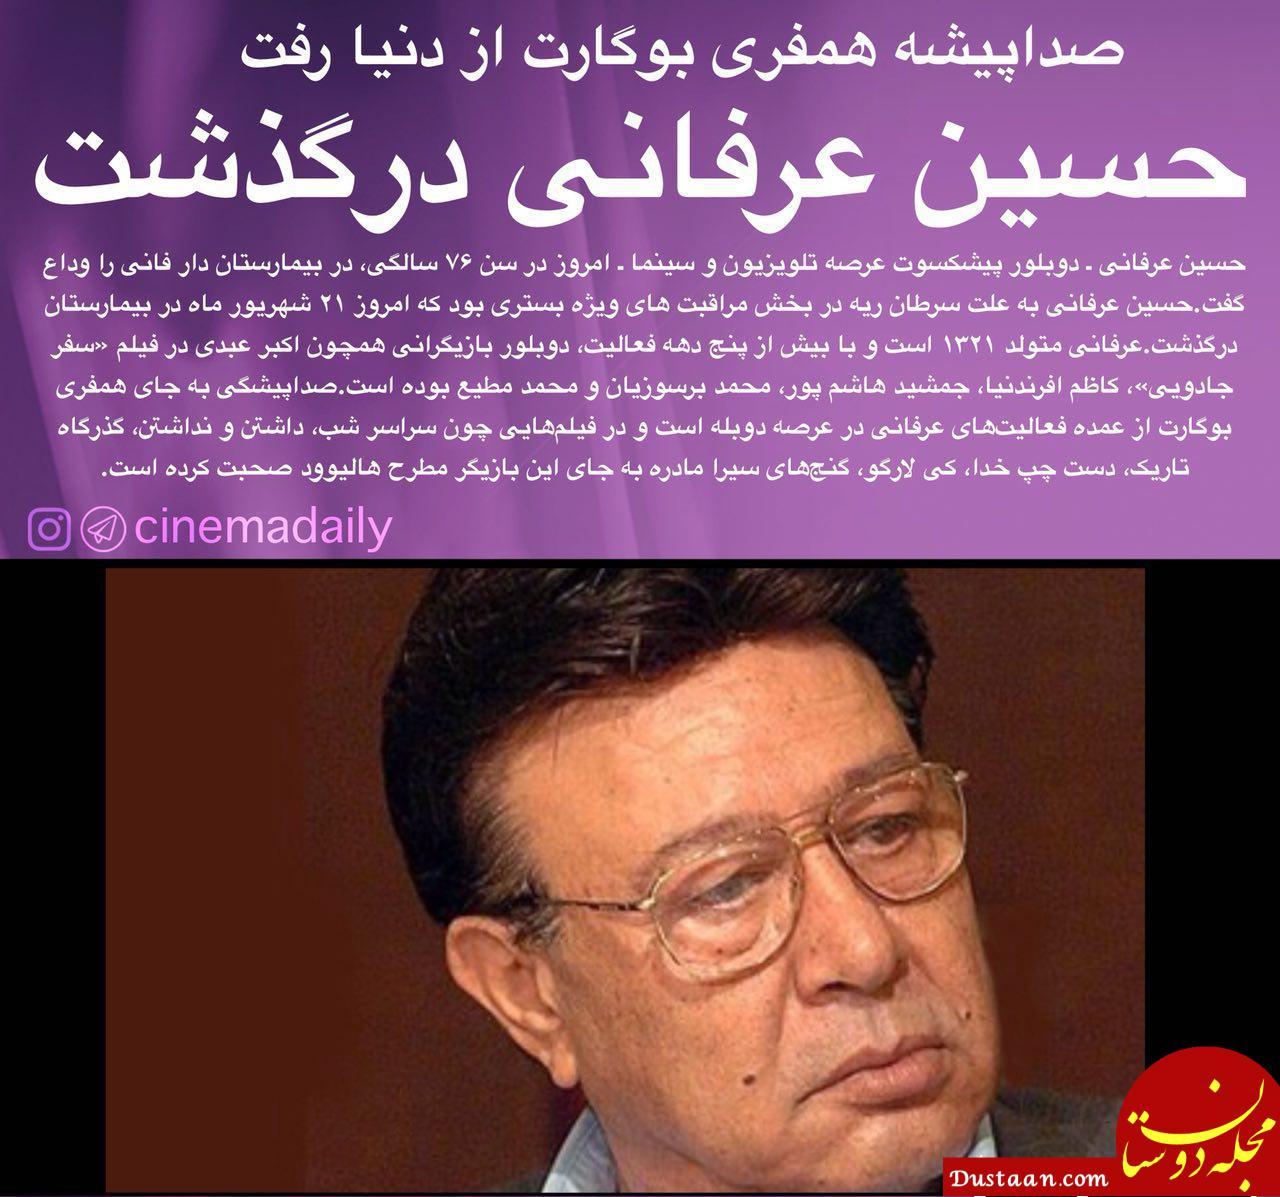 www.dustaan.com حسین عرفانی دوبلور باسابقه تلویزیون درگذشت